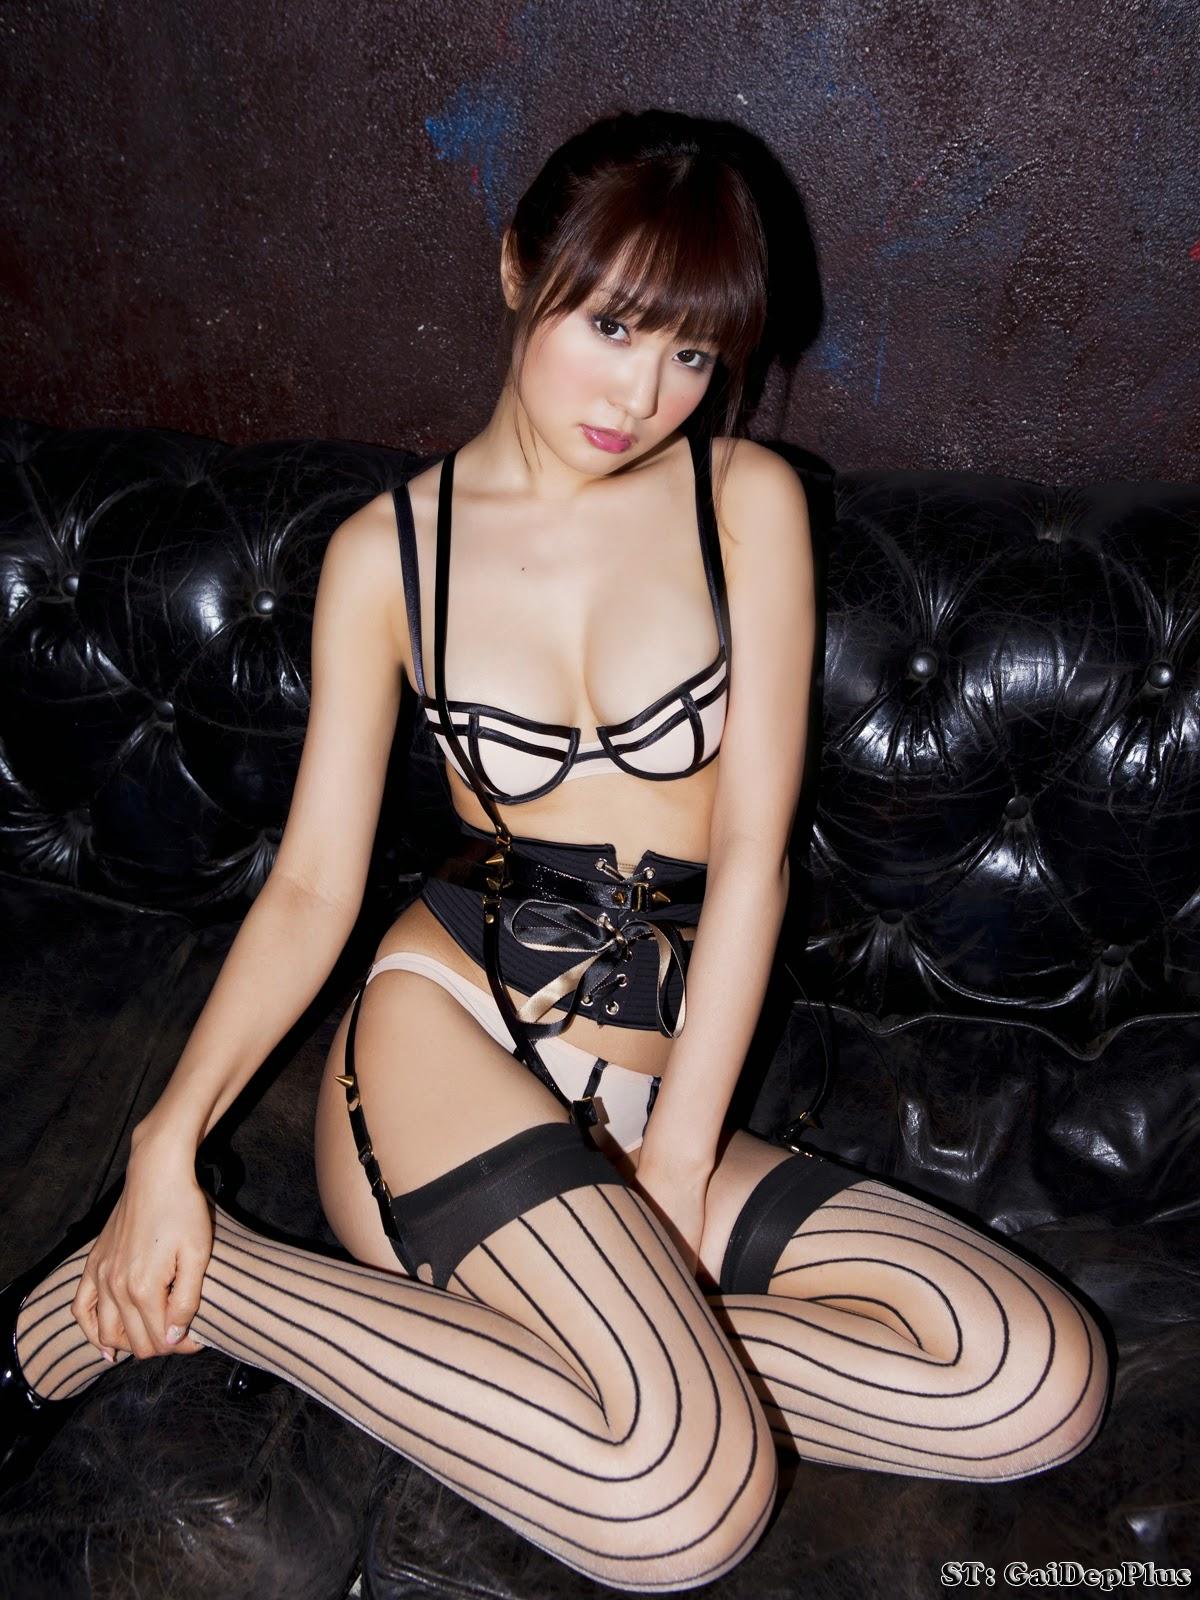 misaki nito boast stunning body with bikini